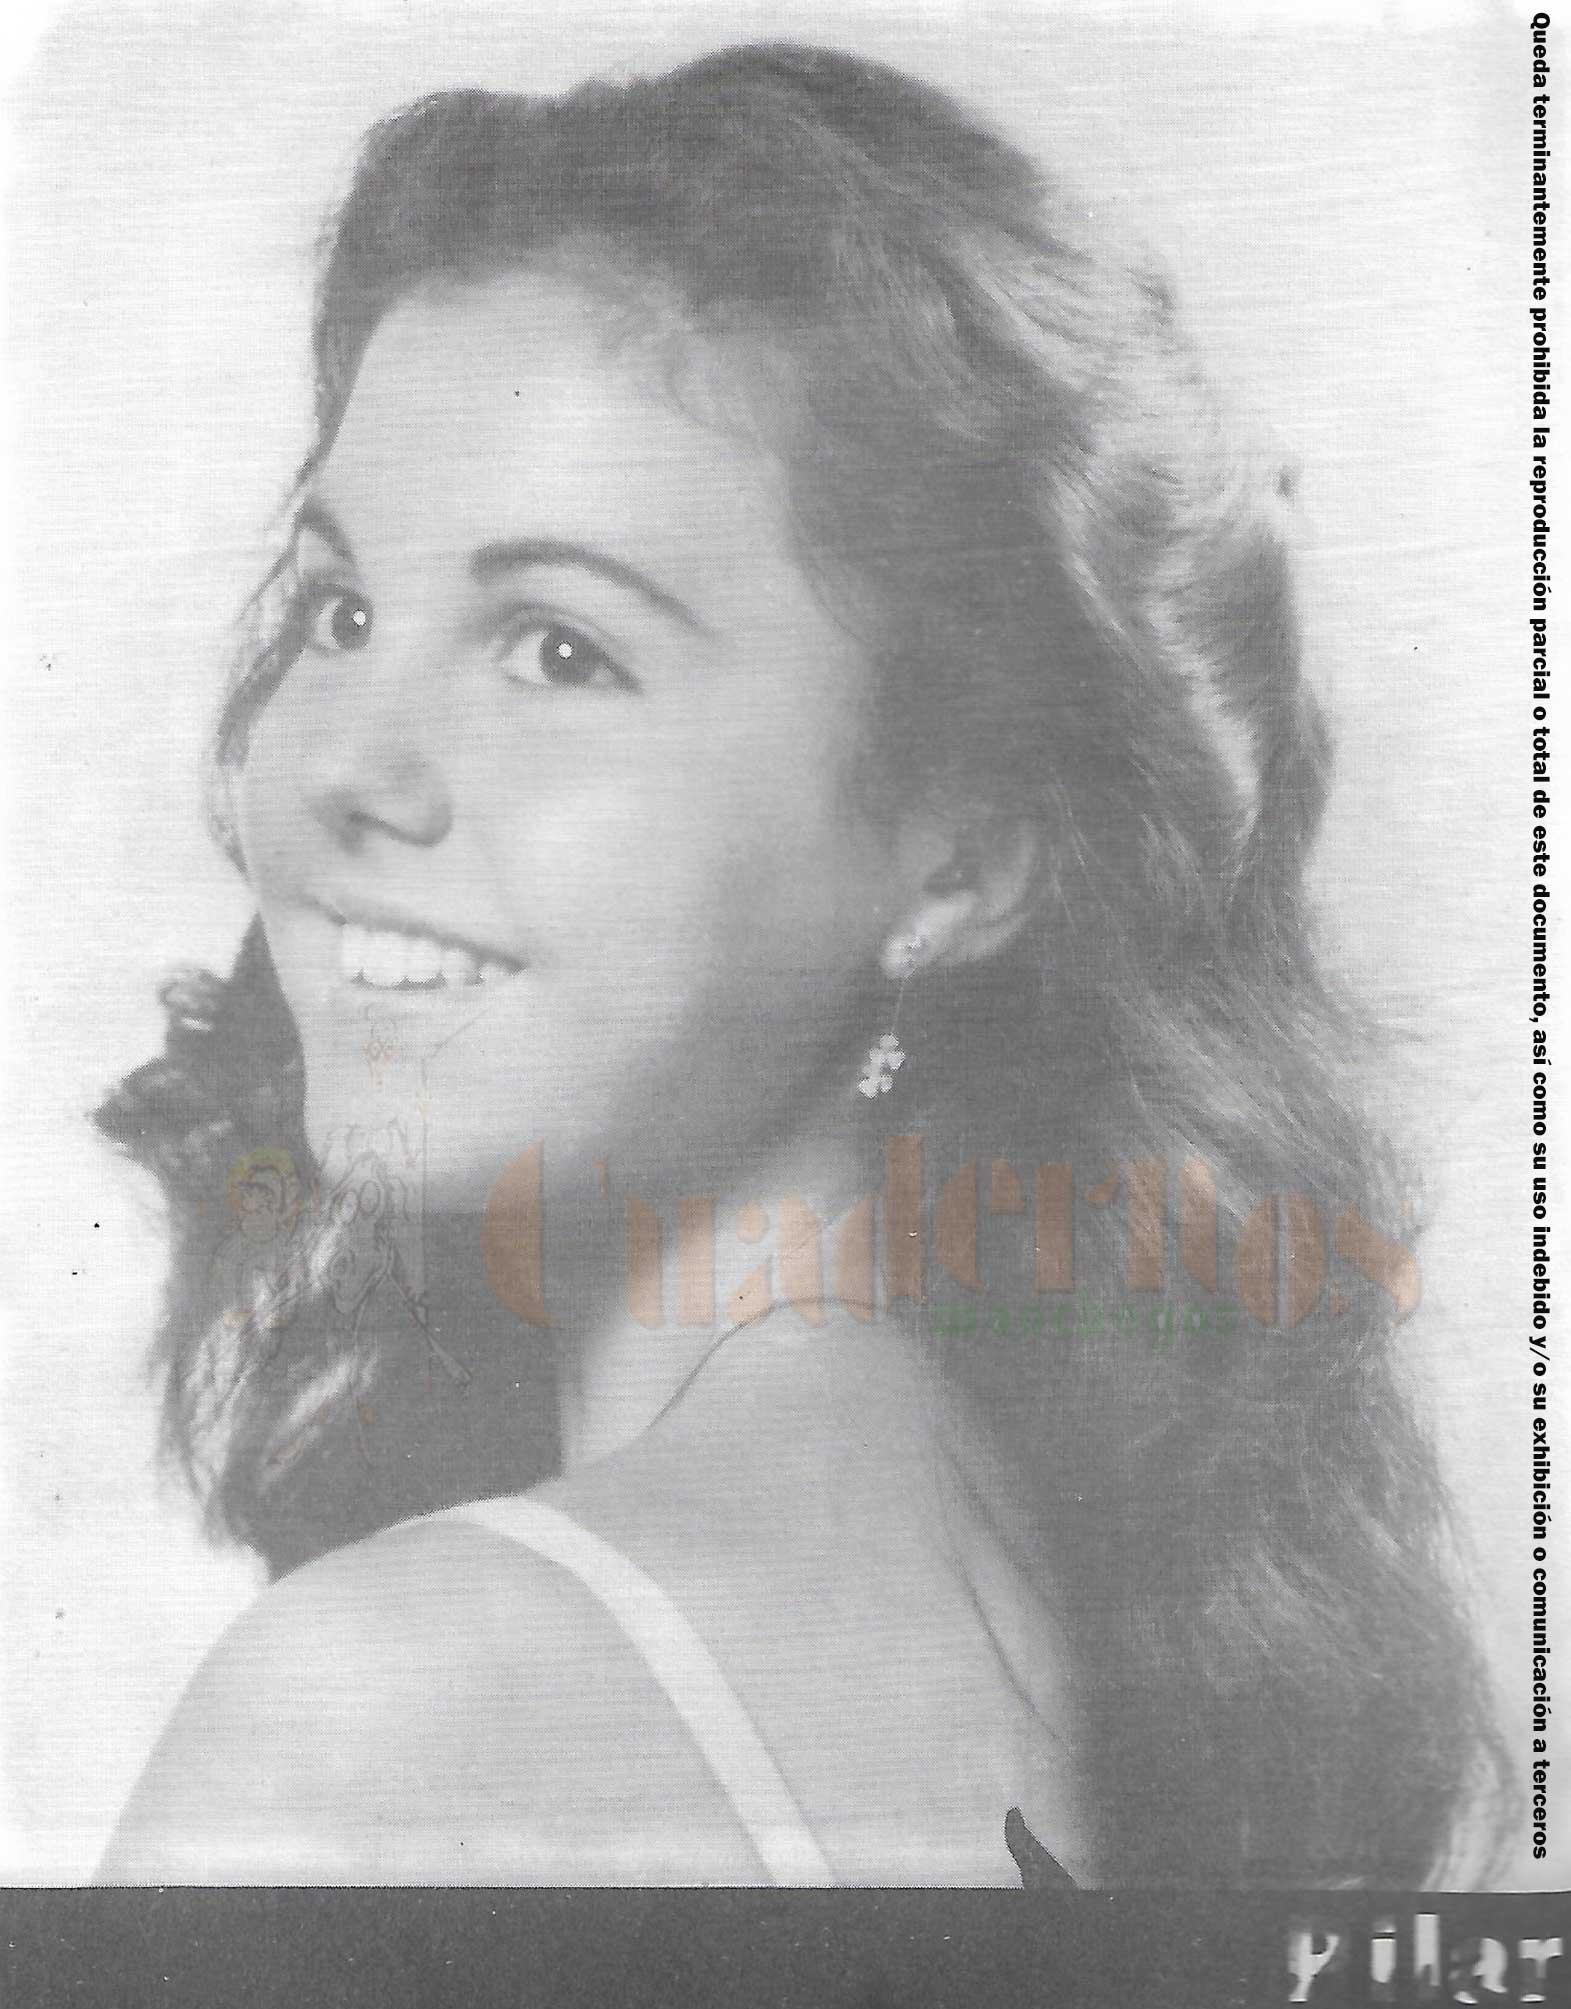 Madrinas Tomelloso 1982